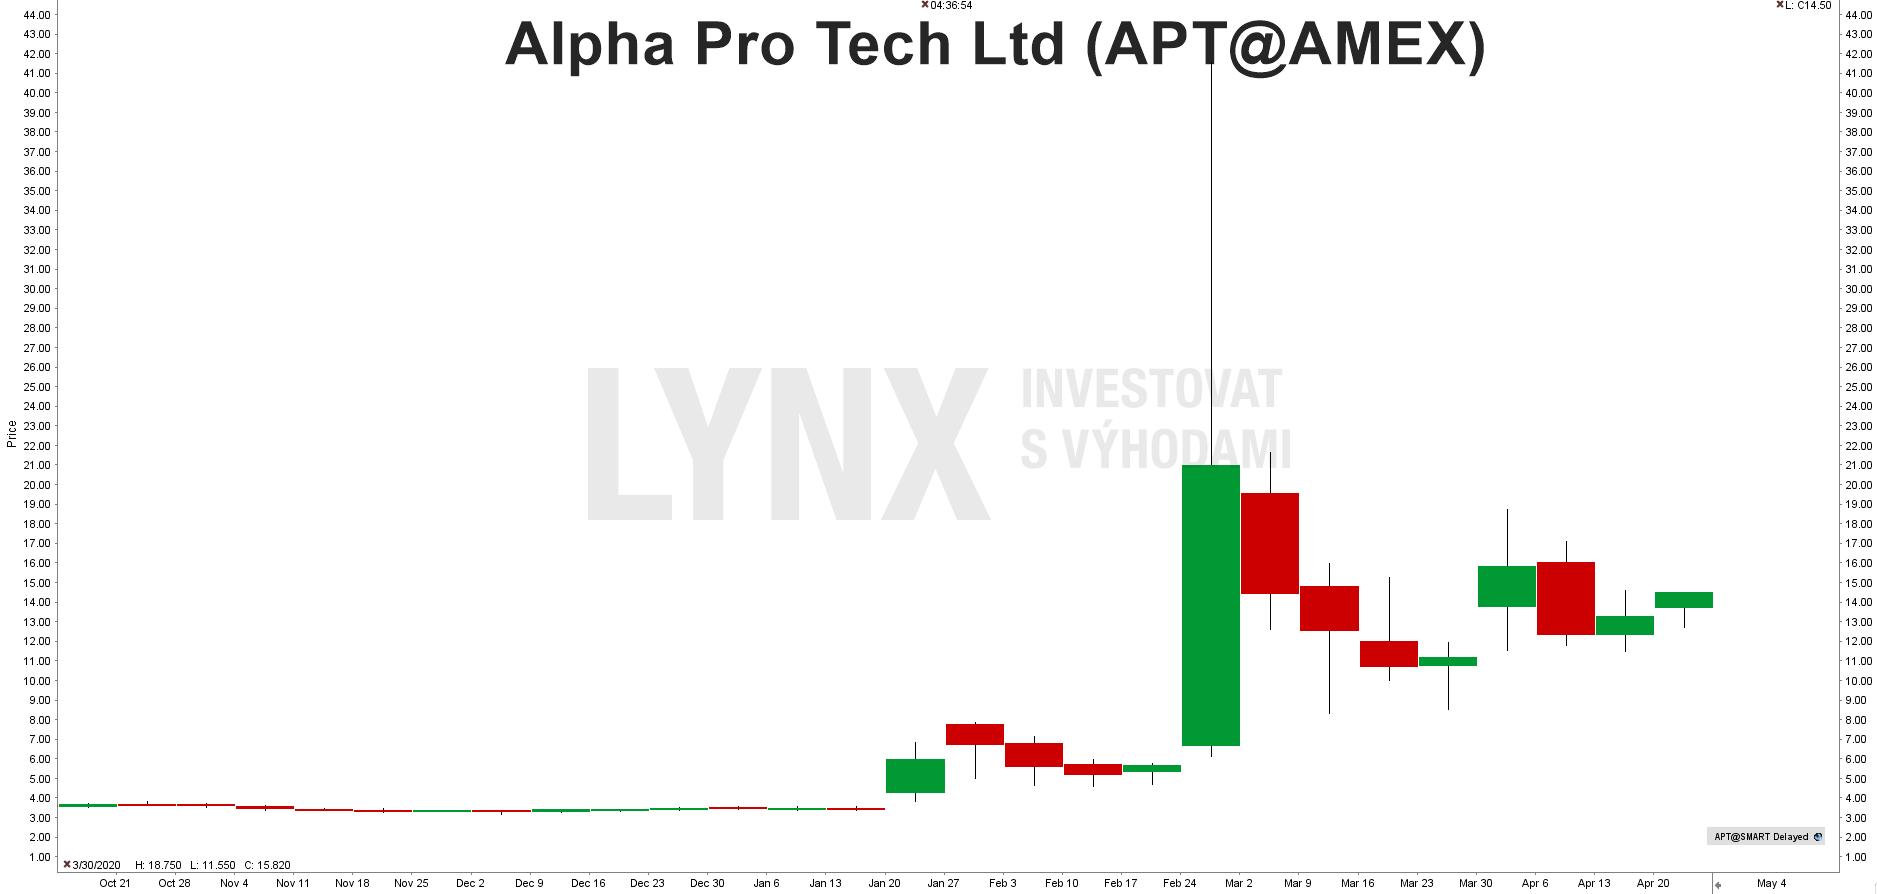 Graf akcie Alpha Pro Tech (APT)